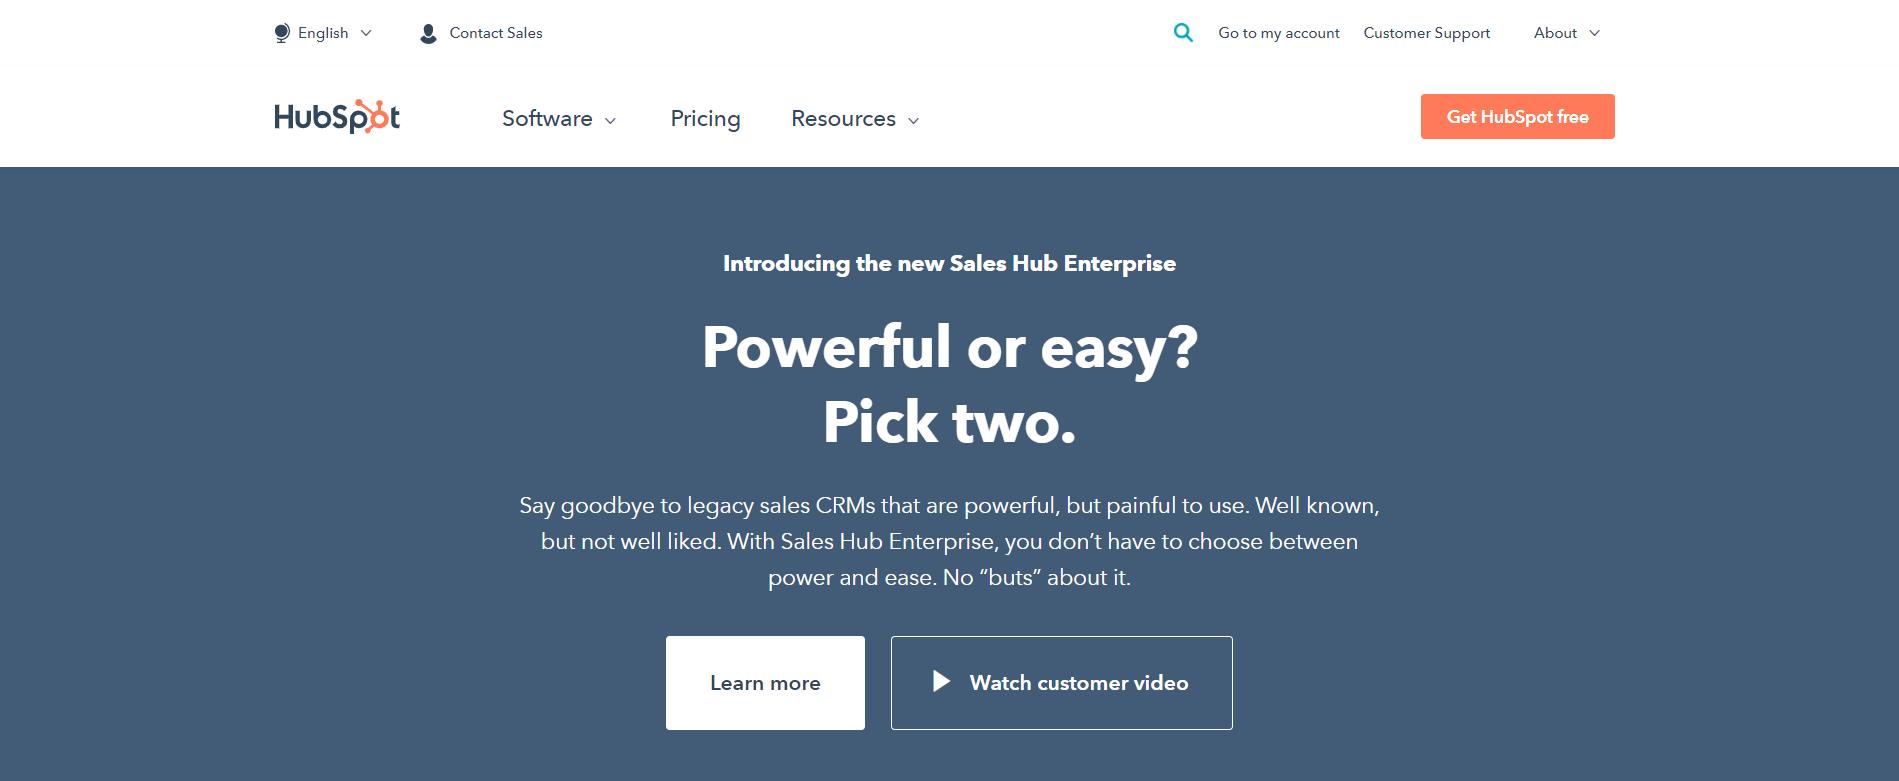 Hubspot-Overview- Engagebay vs Hubspot